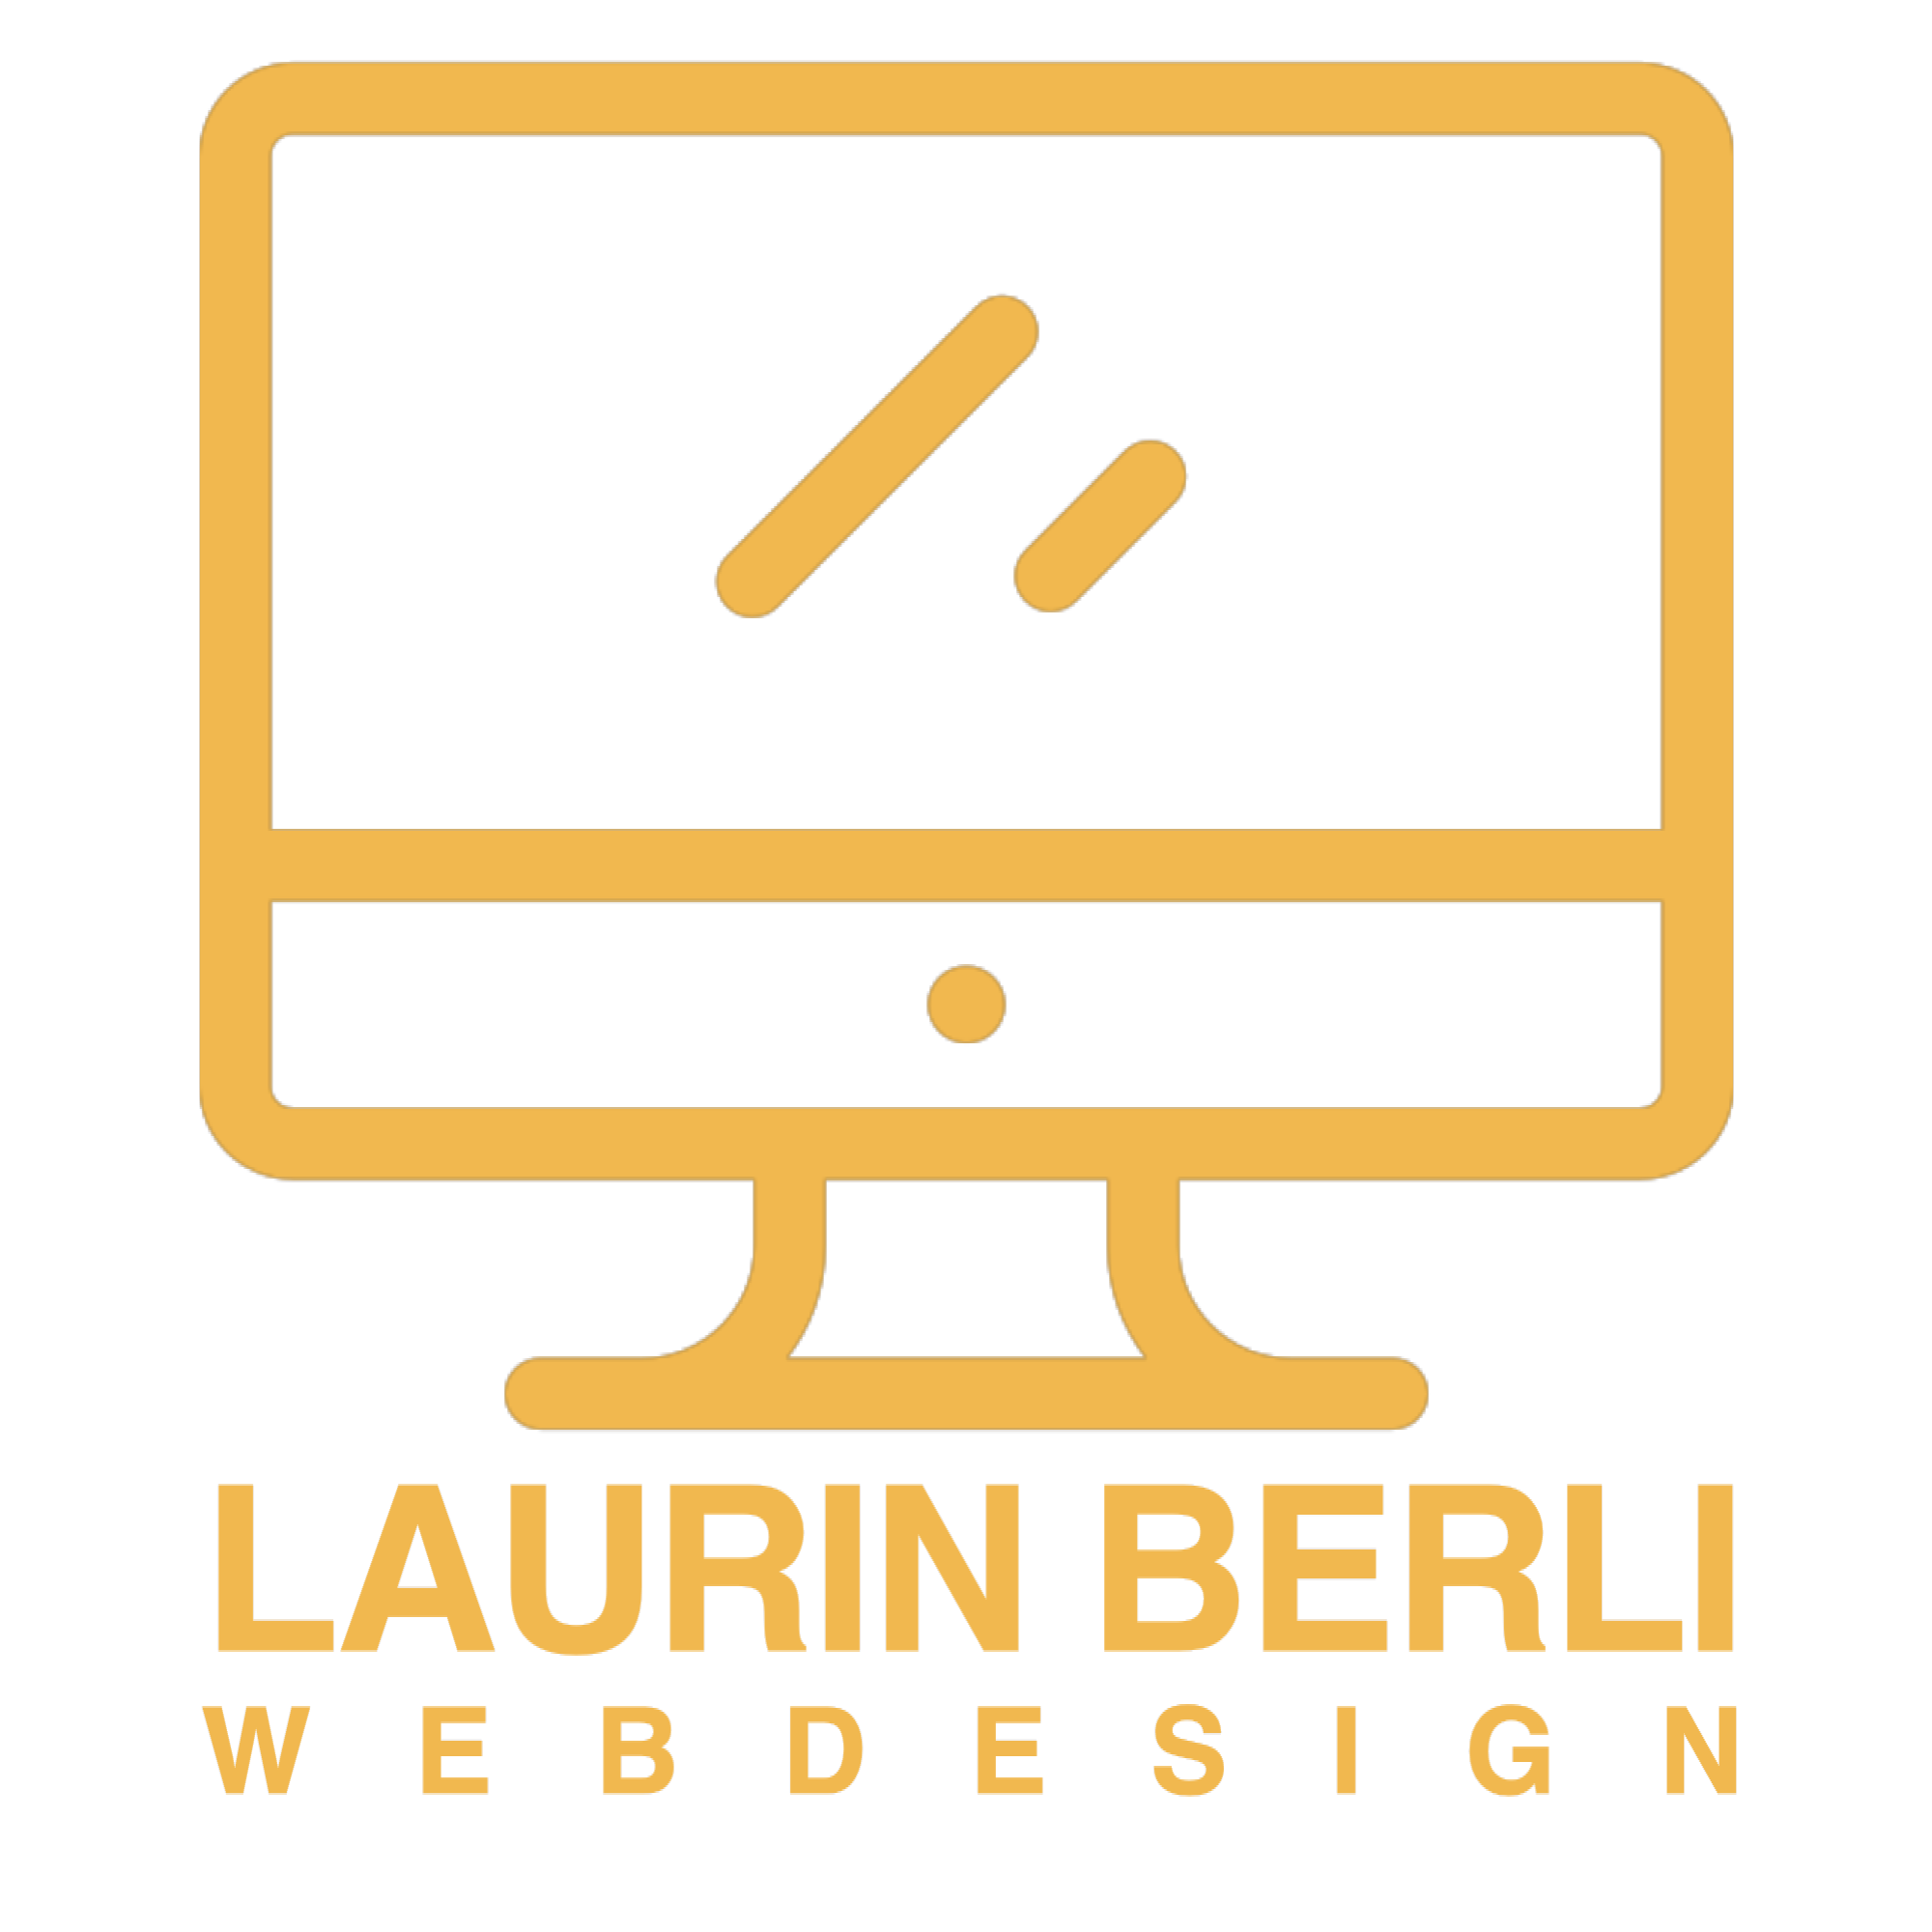 Laurin Berli Webdesign